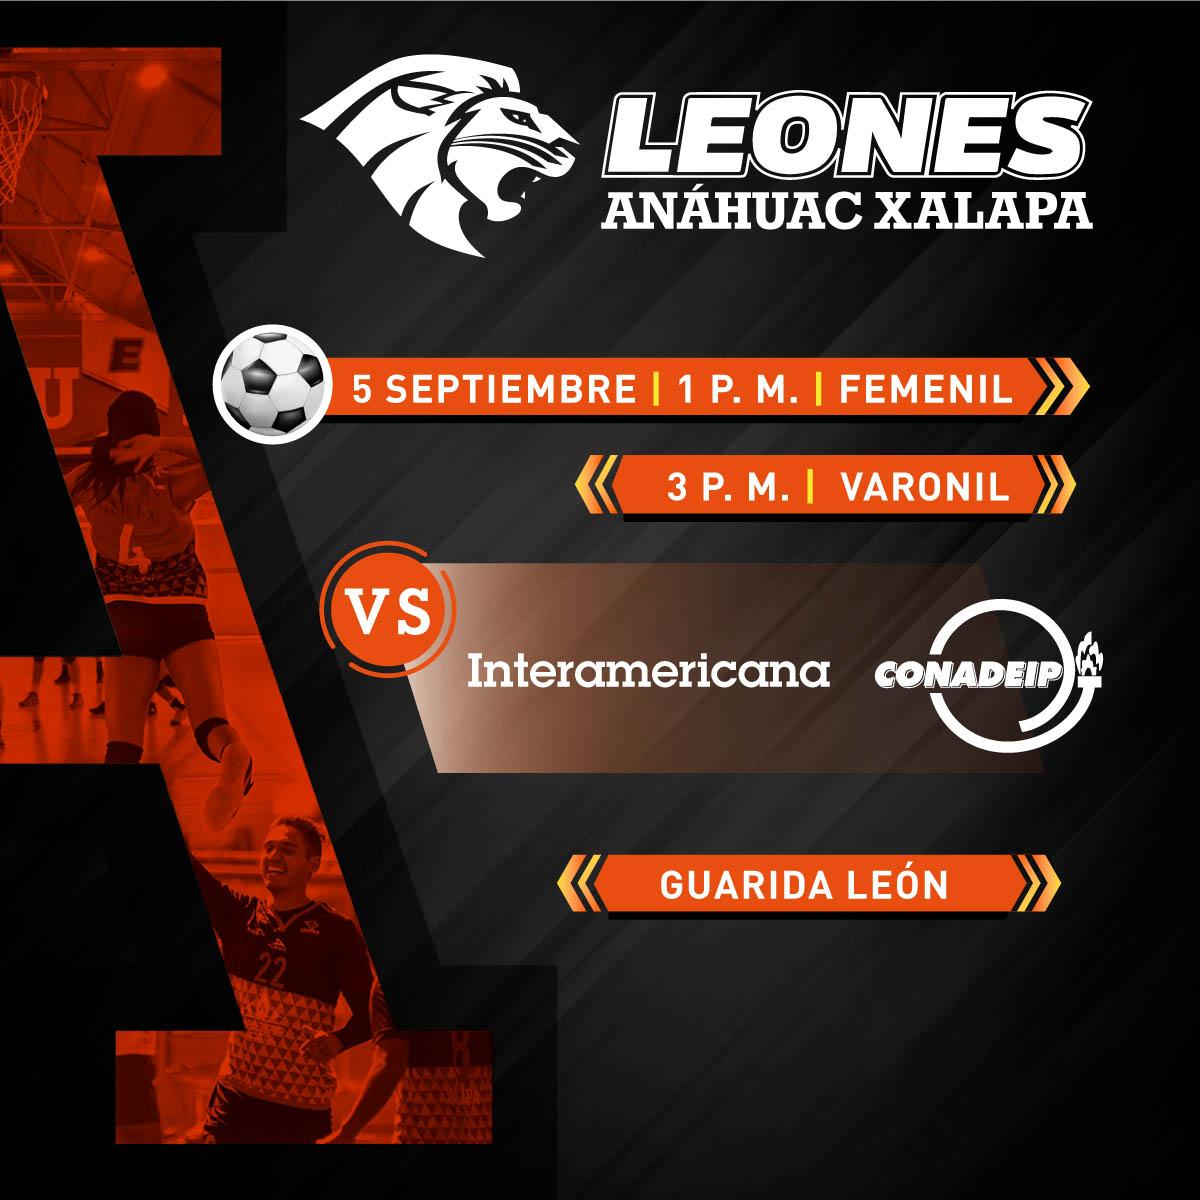 Fútbol Soccer Femenil y Varonil: Anáhuac Xalapa vs Interamericana